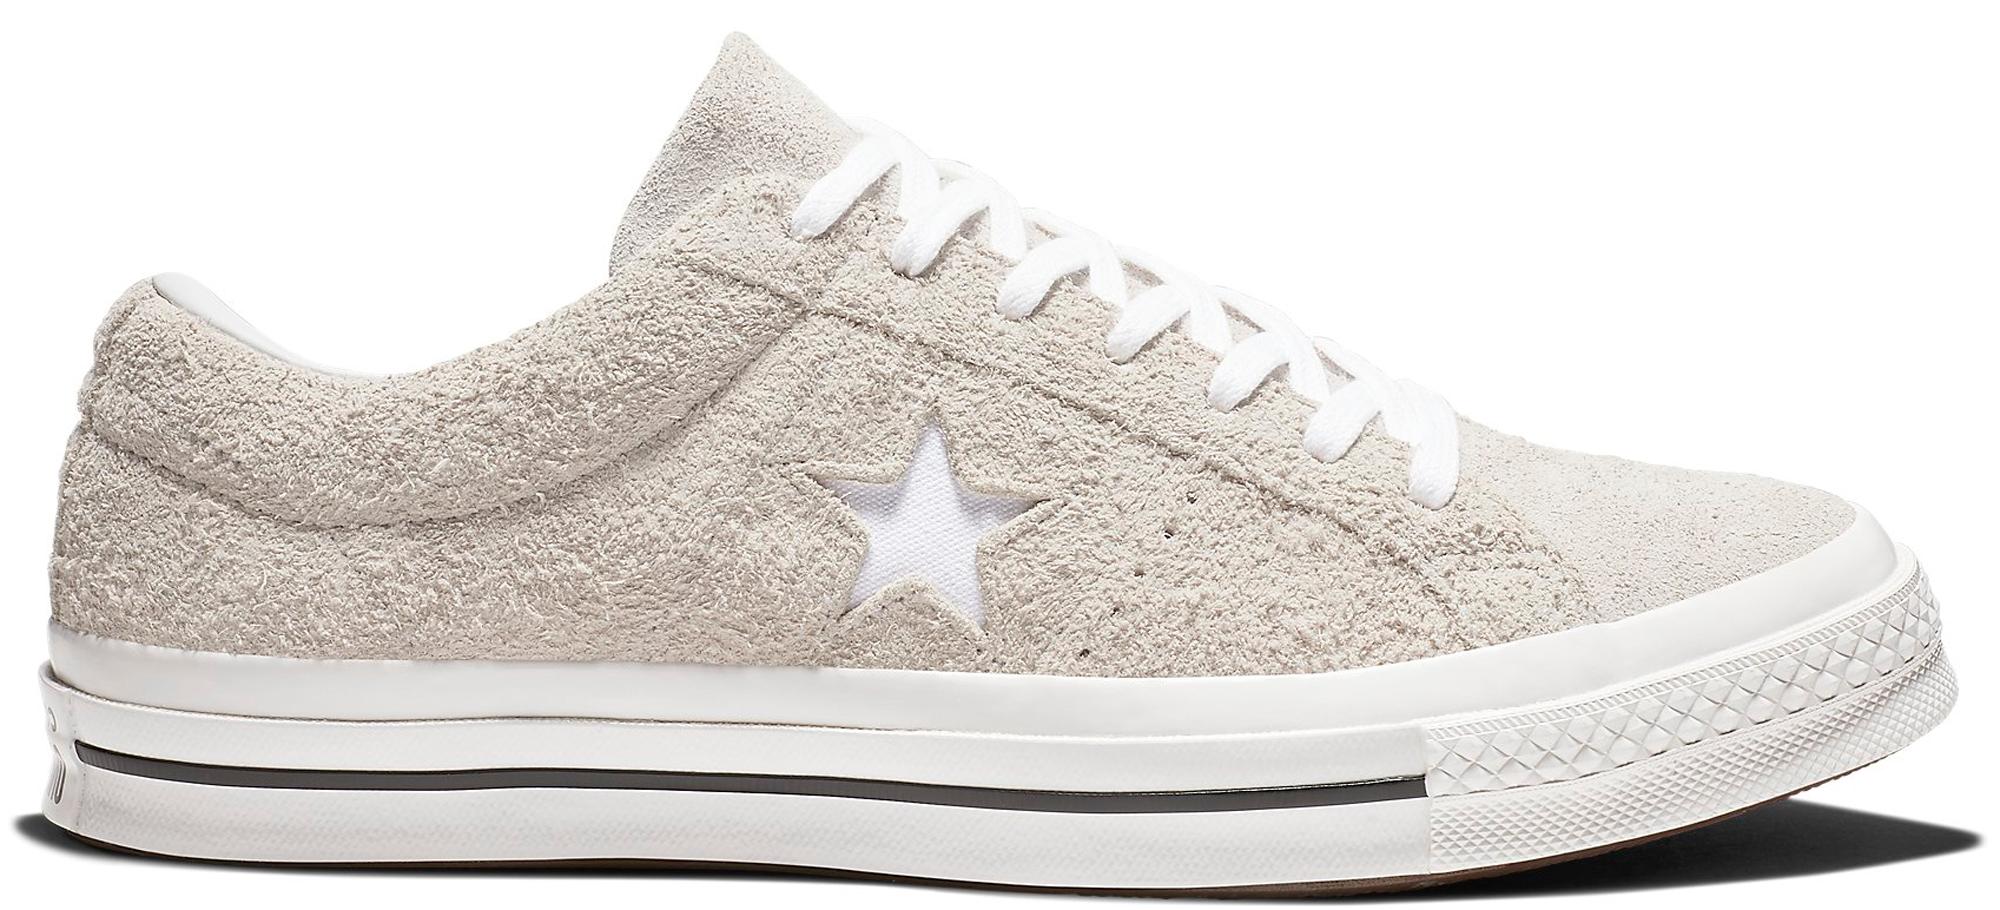 Converse One Star Ox Vintage White